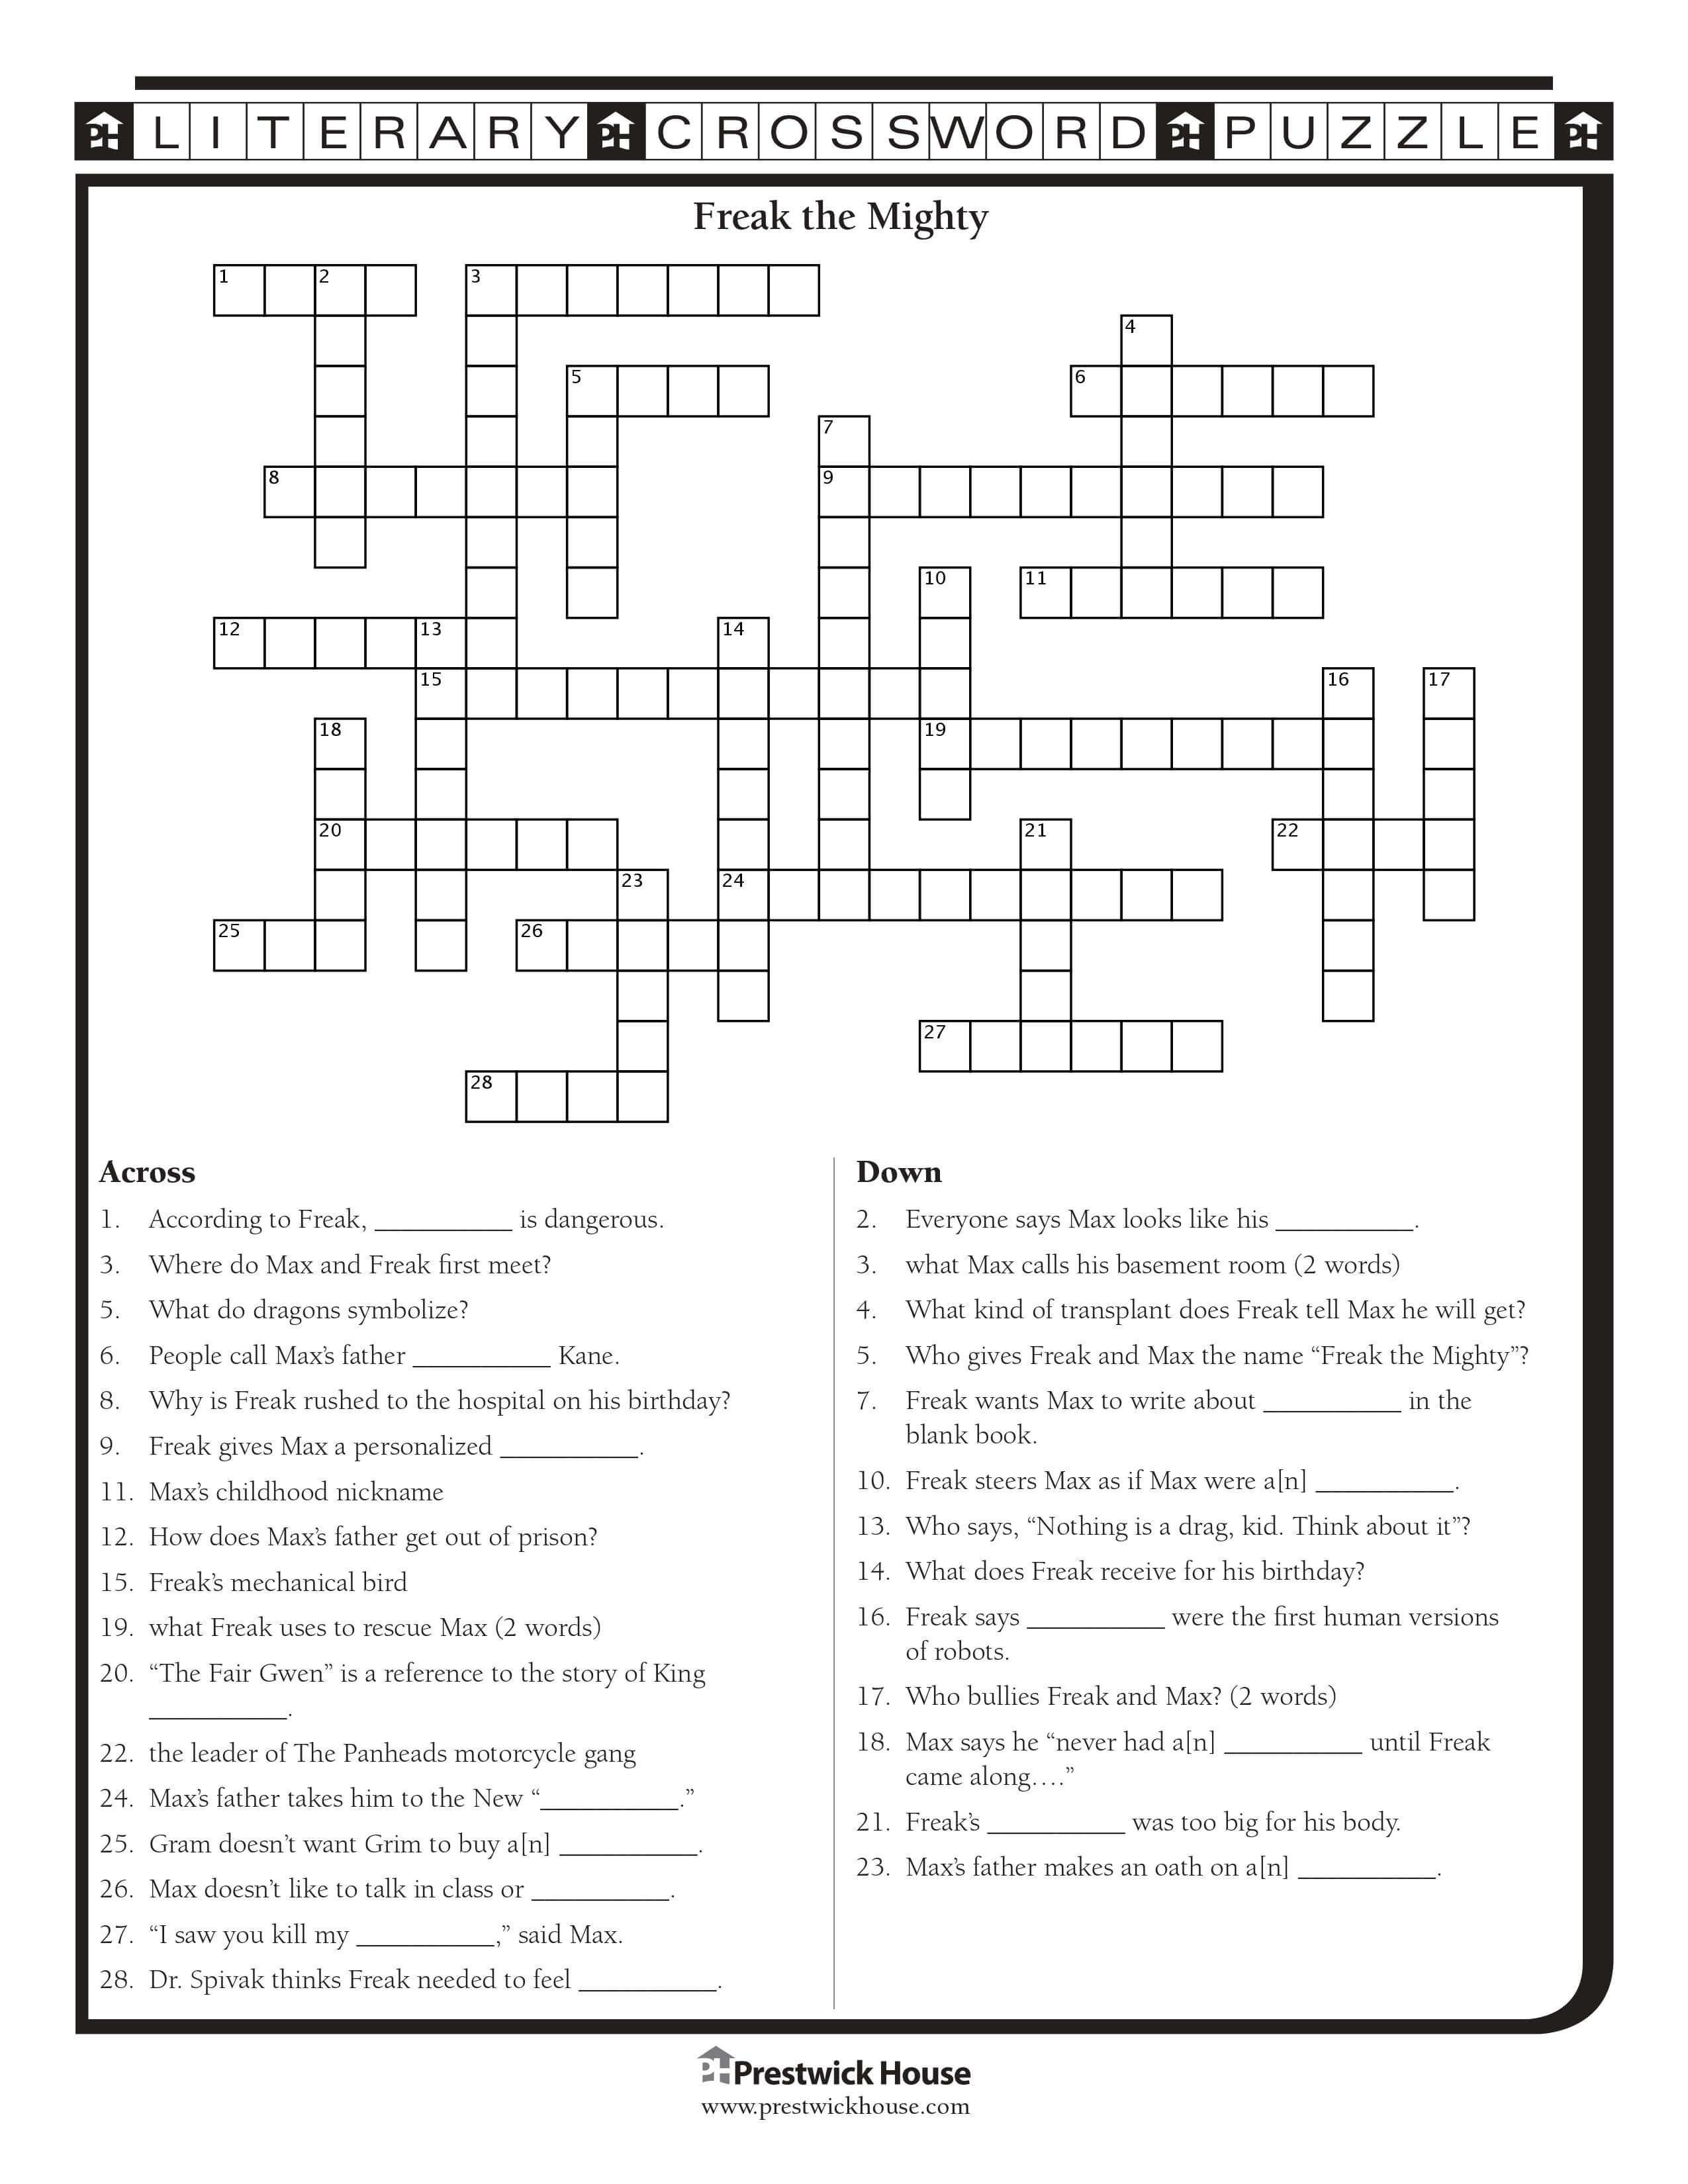 Freak The Mighty Crossword Puzzle Freak The Mighty Printable